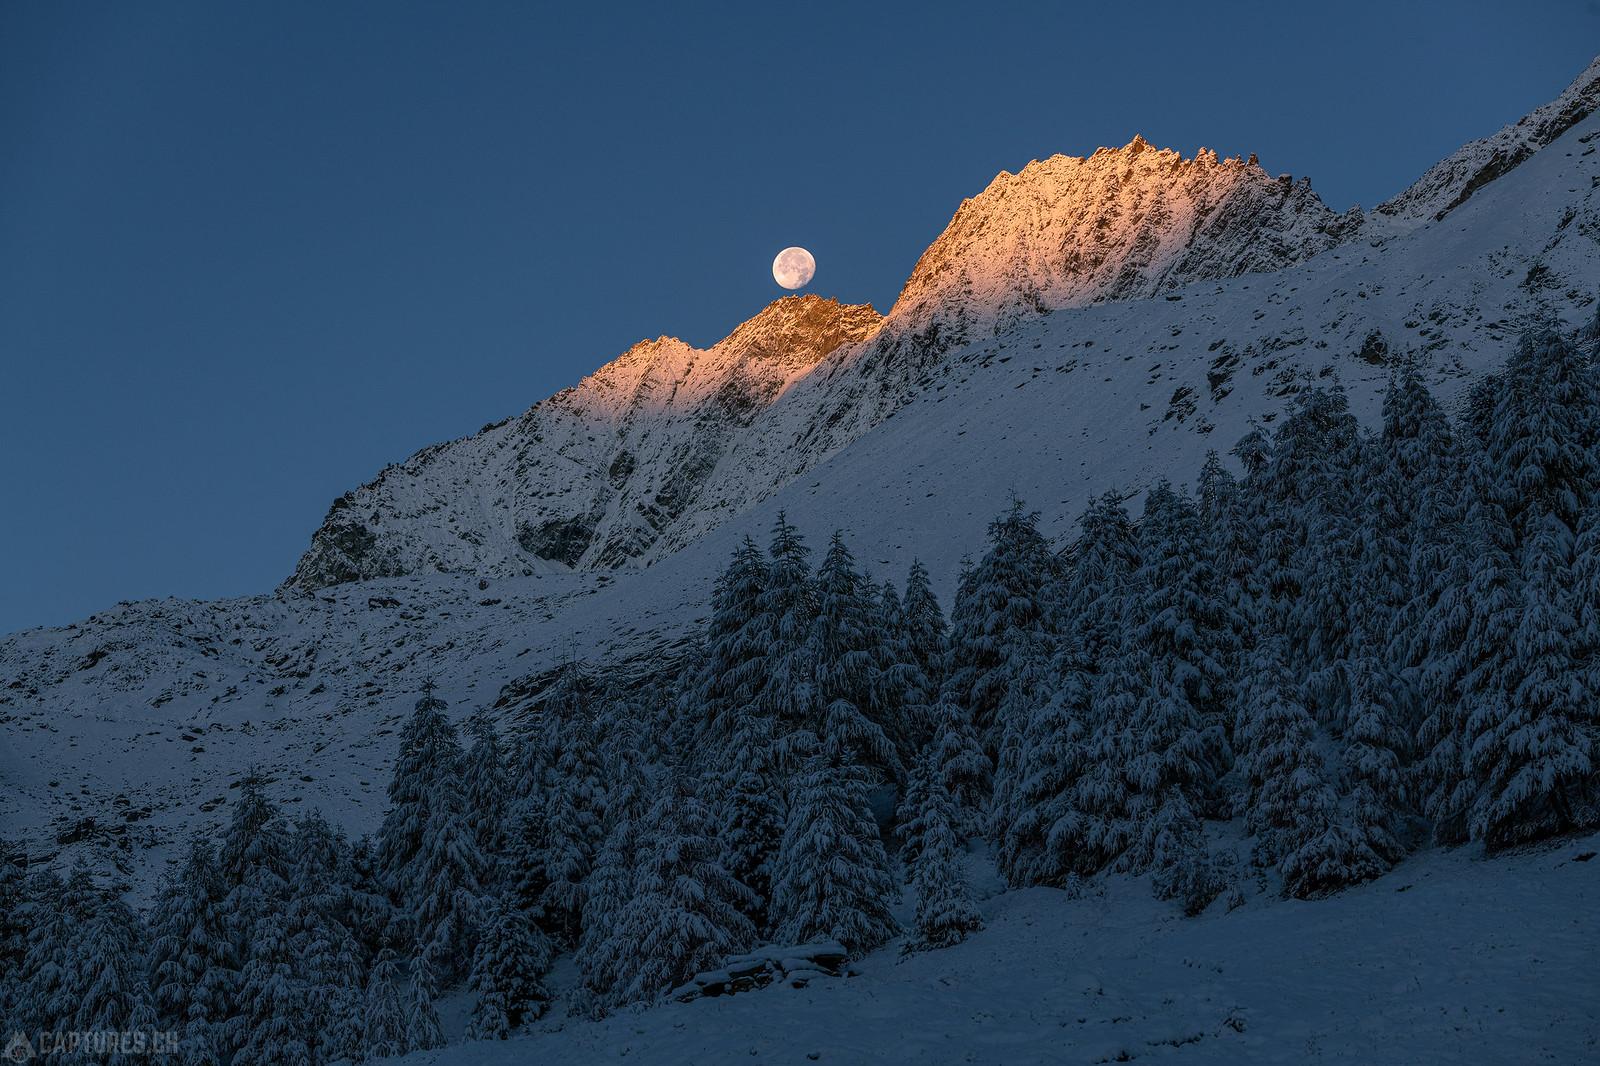 Moon setting at sunrise - Lac bleu